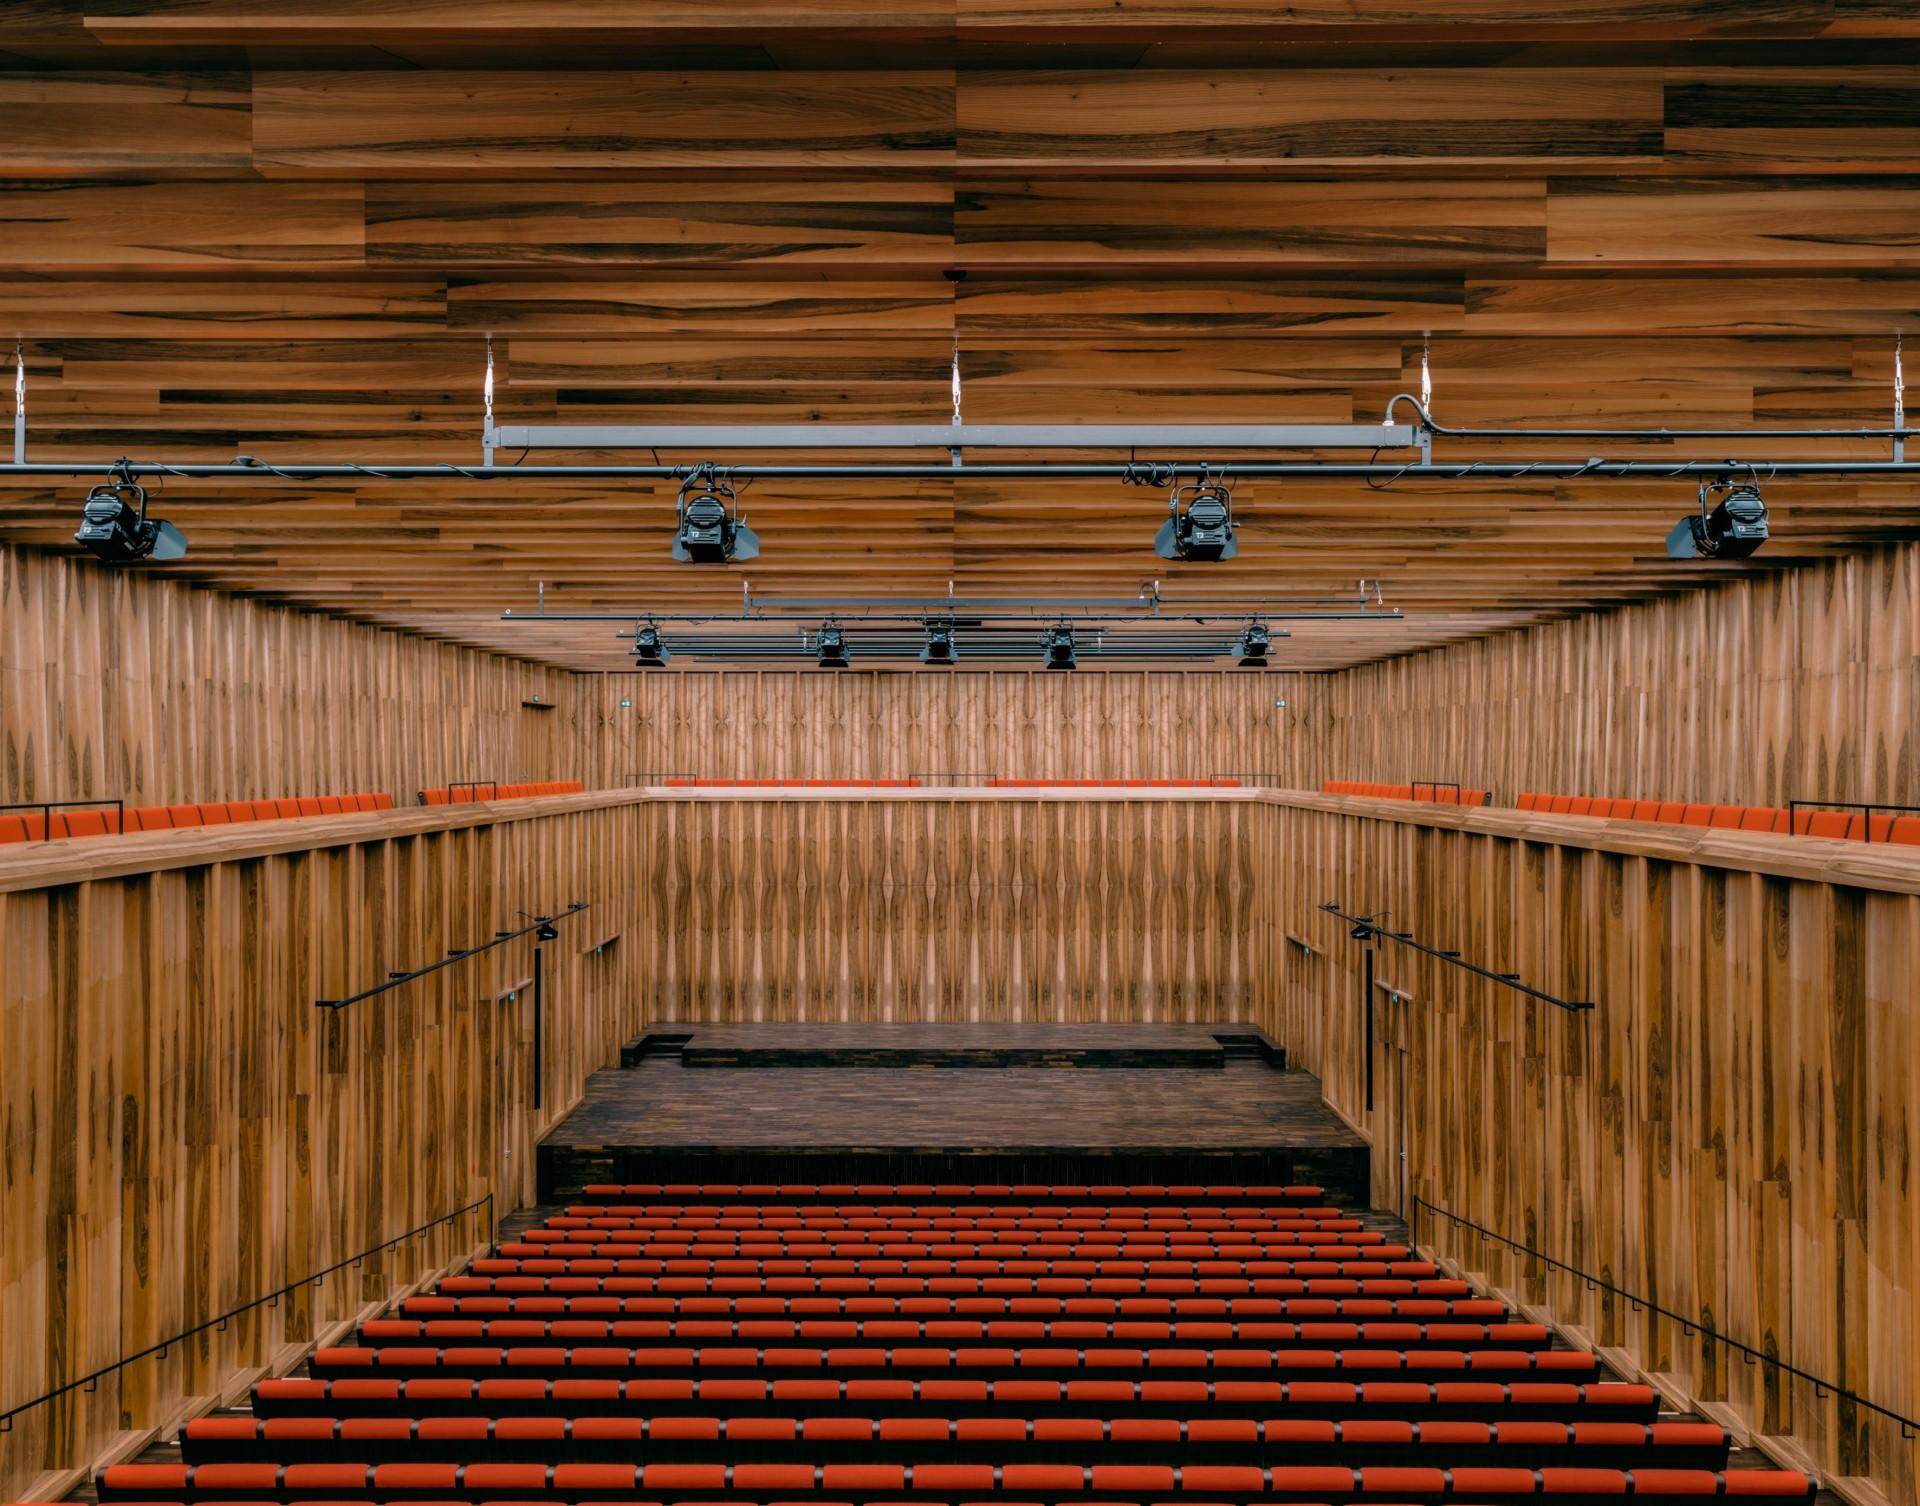 David chipperfield architects foro carmen wuerth - Foro wurth espana ...